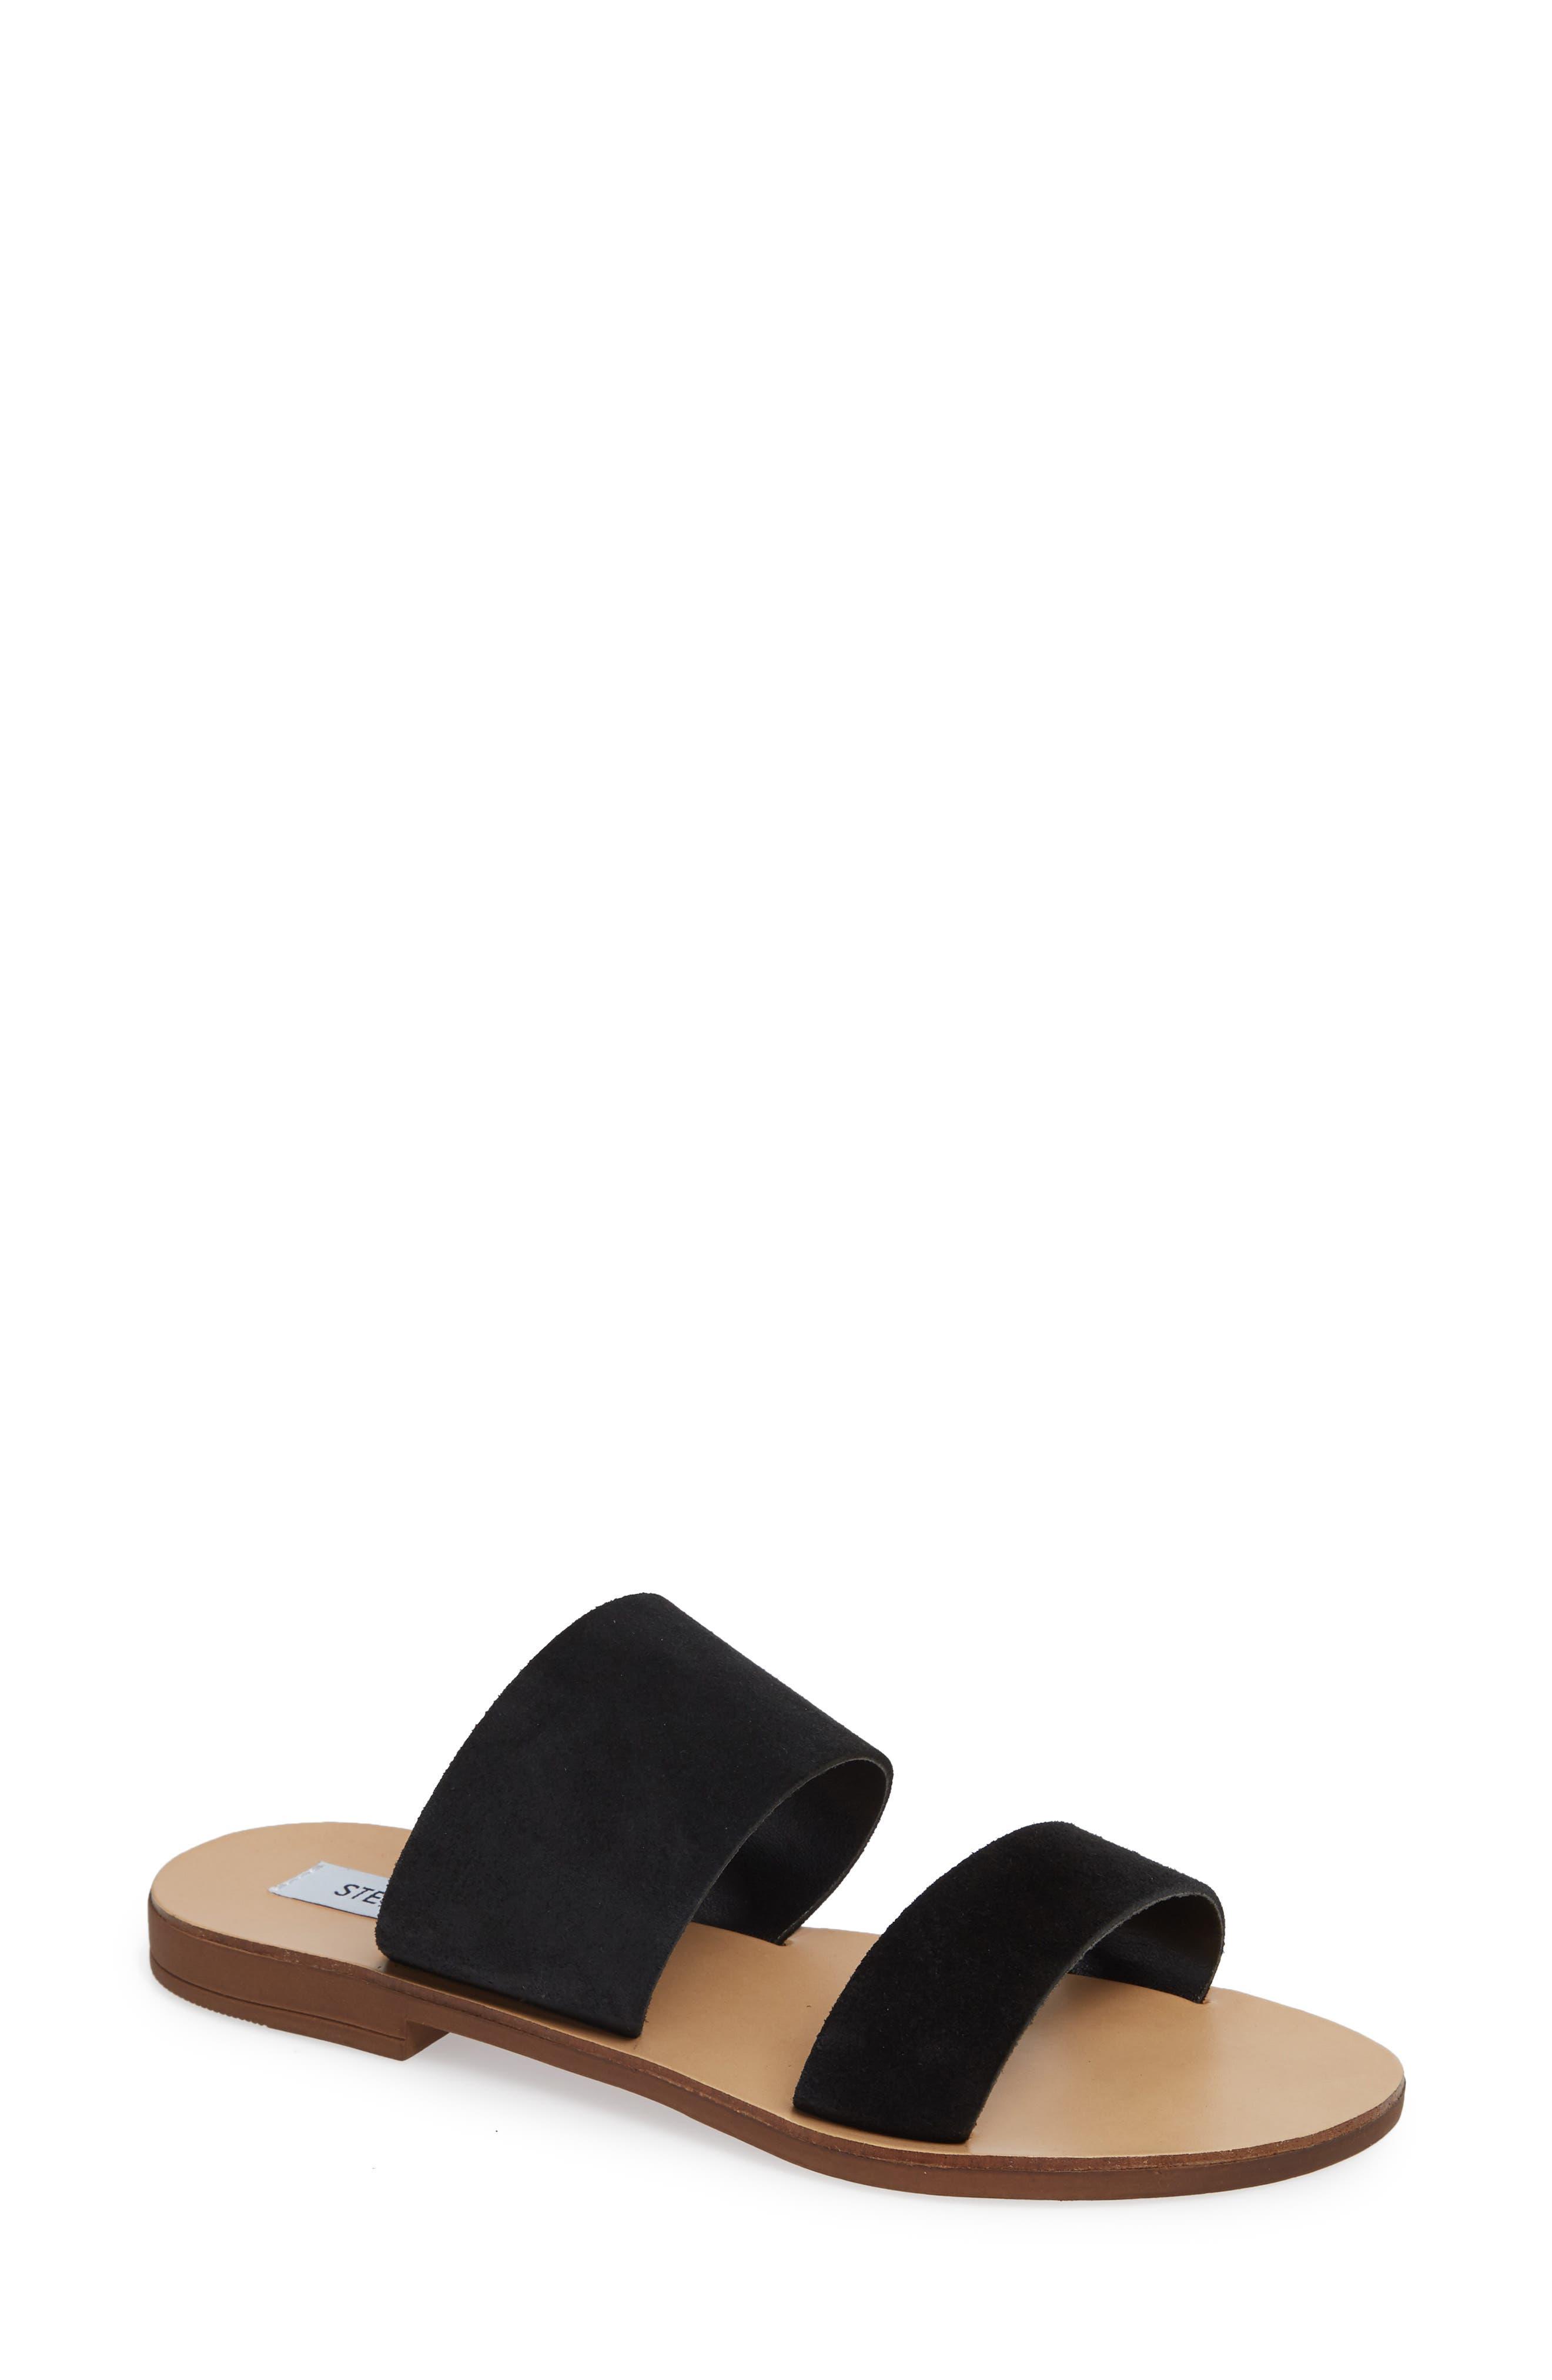 Native Sandal,                         Main,                         color, 006